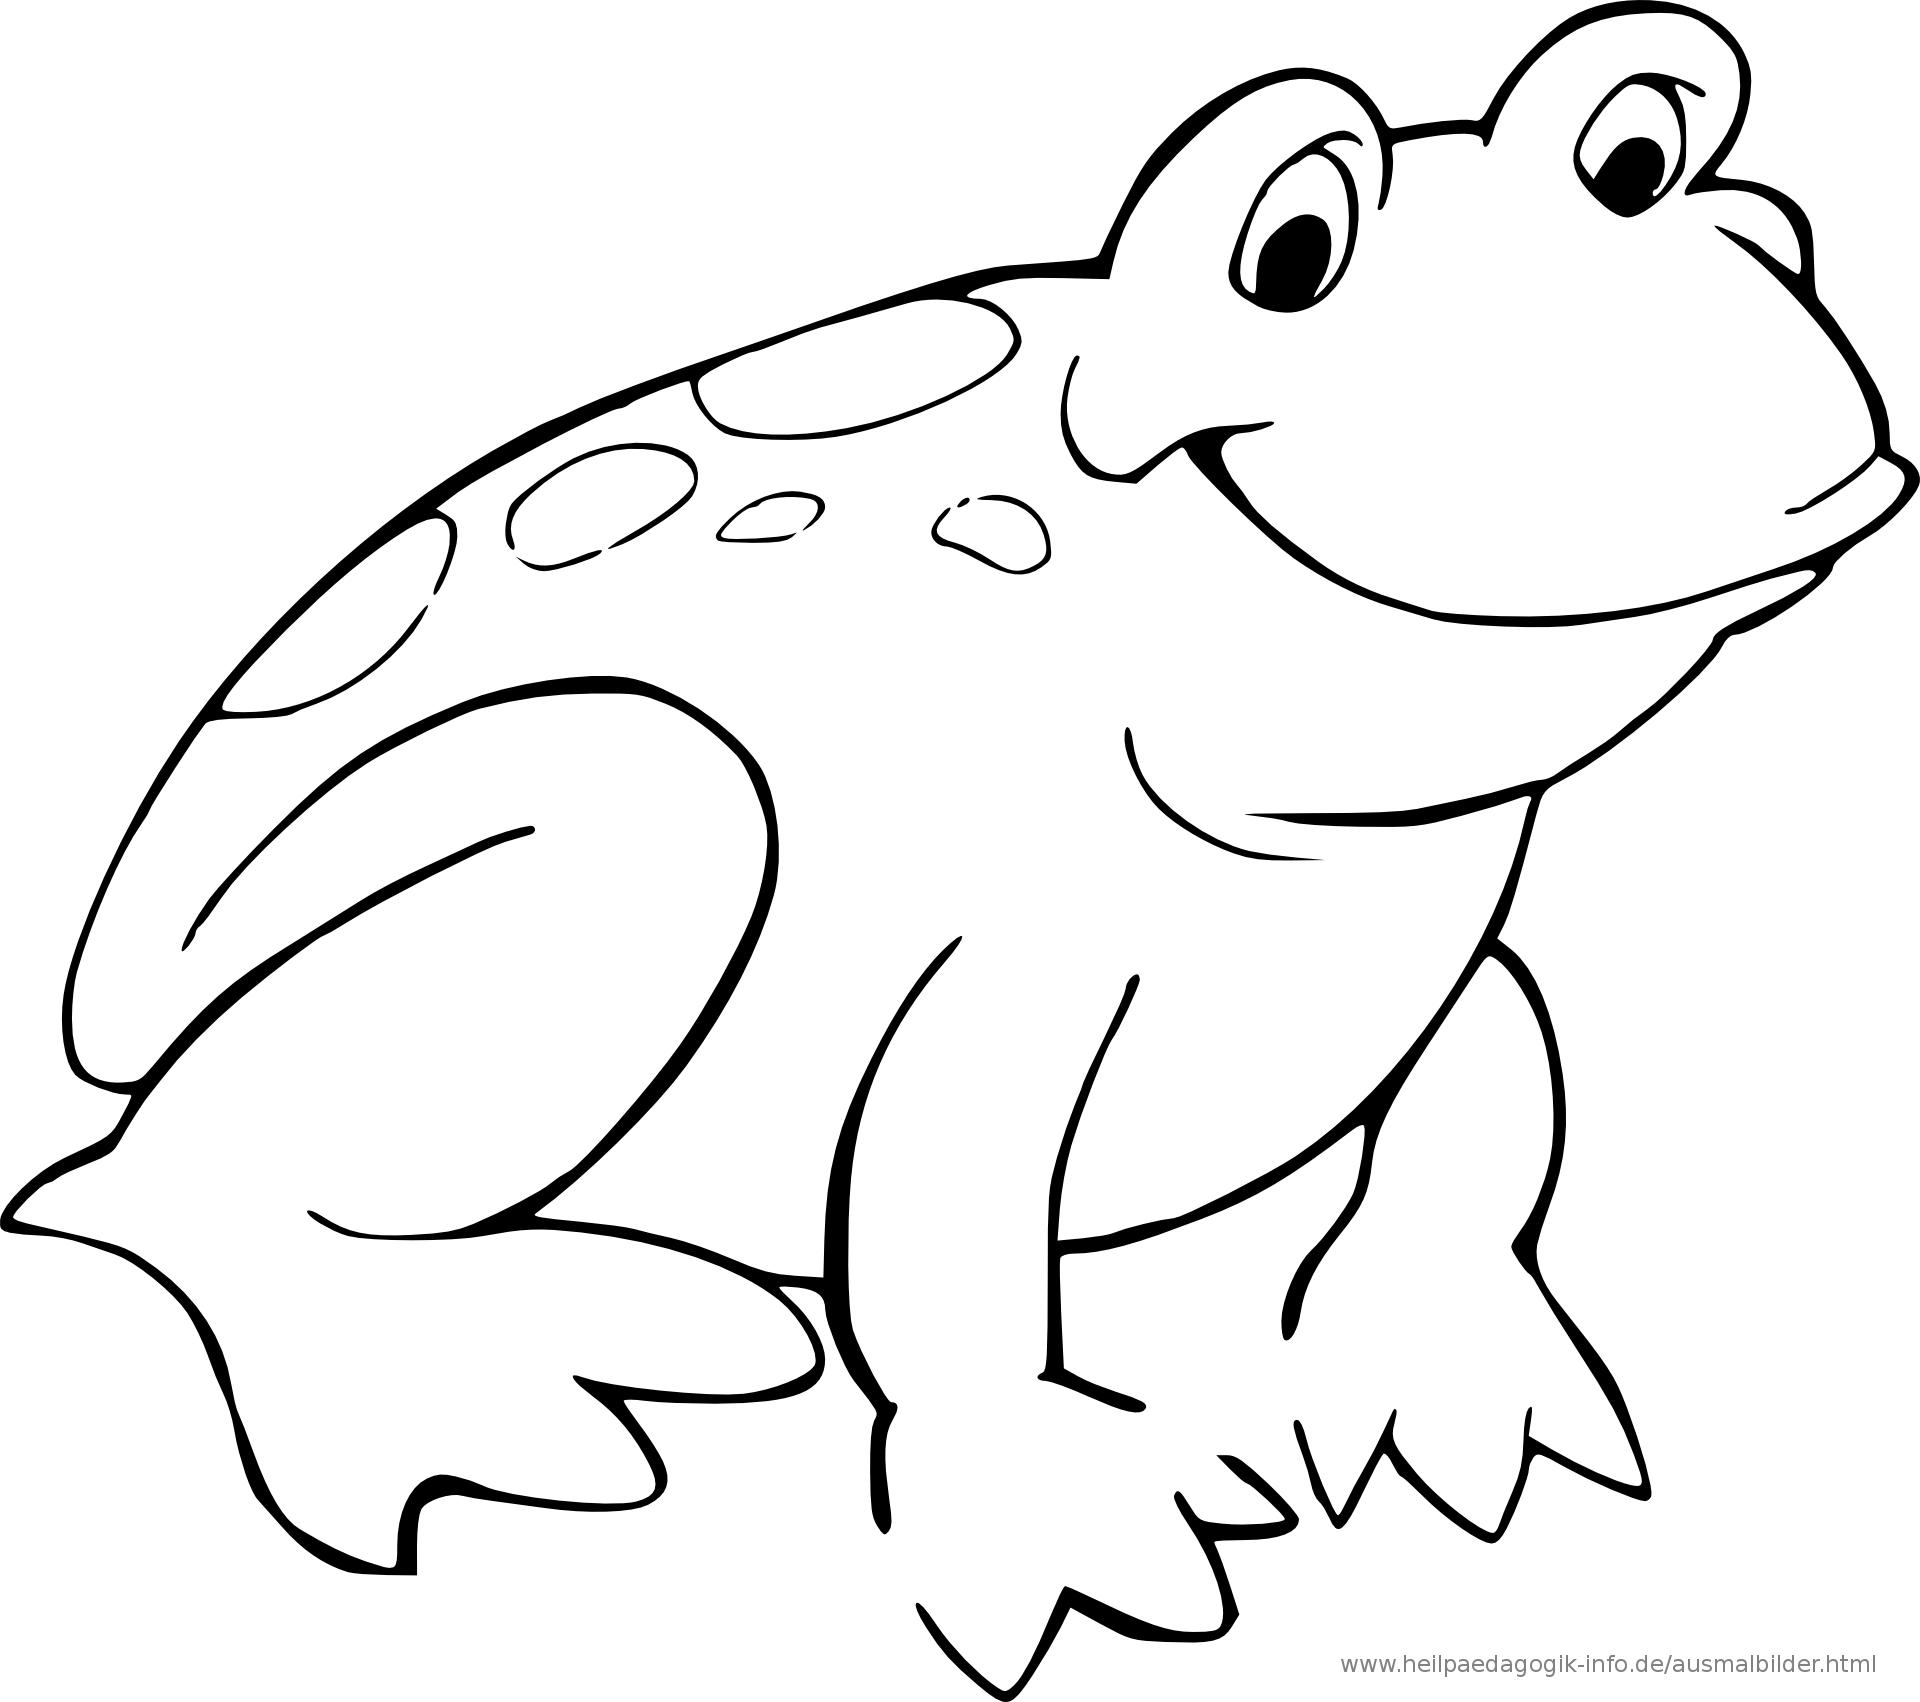 Froesche Ausmalbilder Ausmalbilder Froesche Frosch